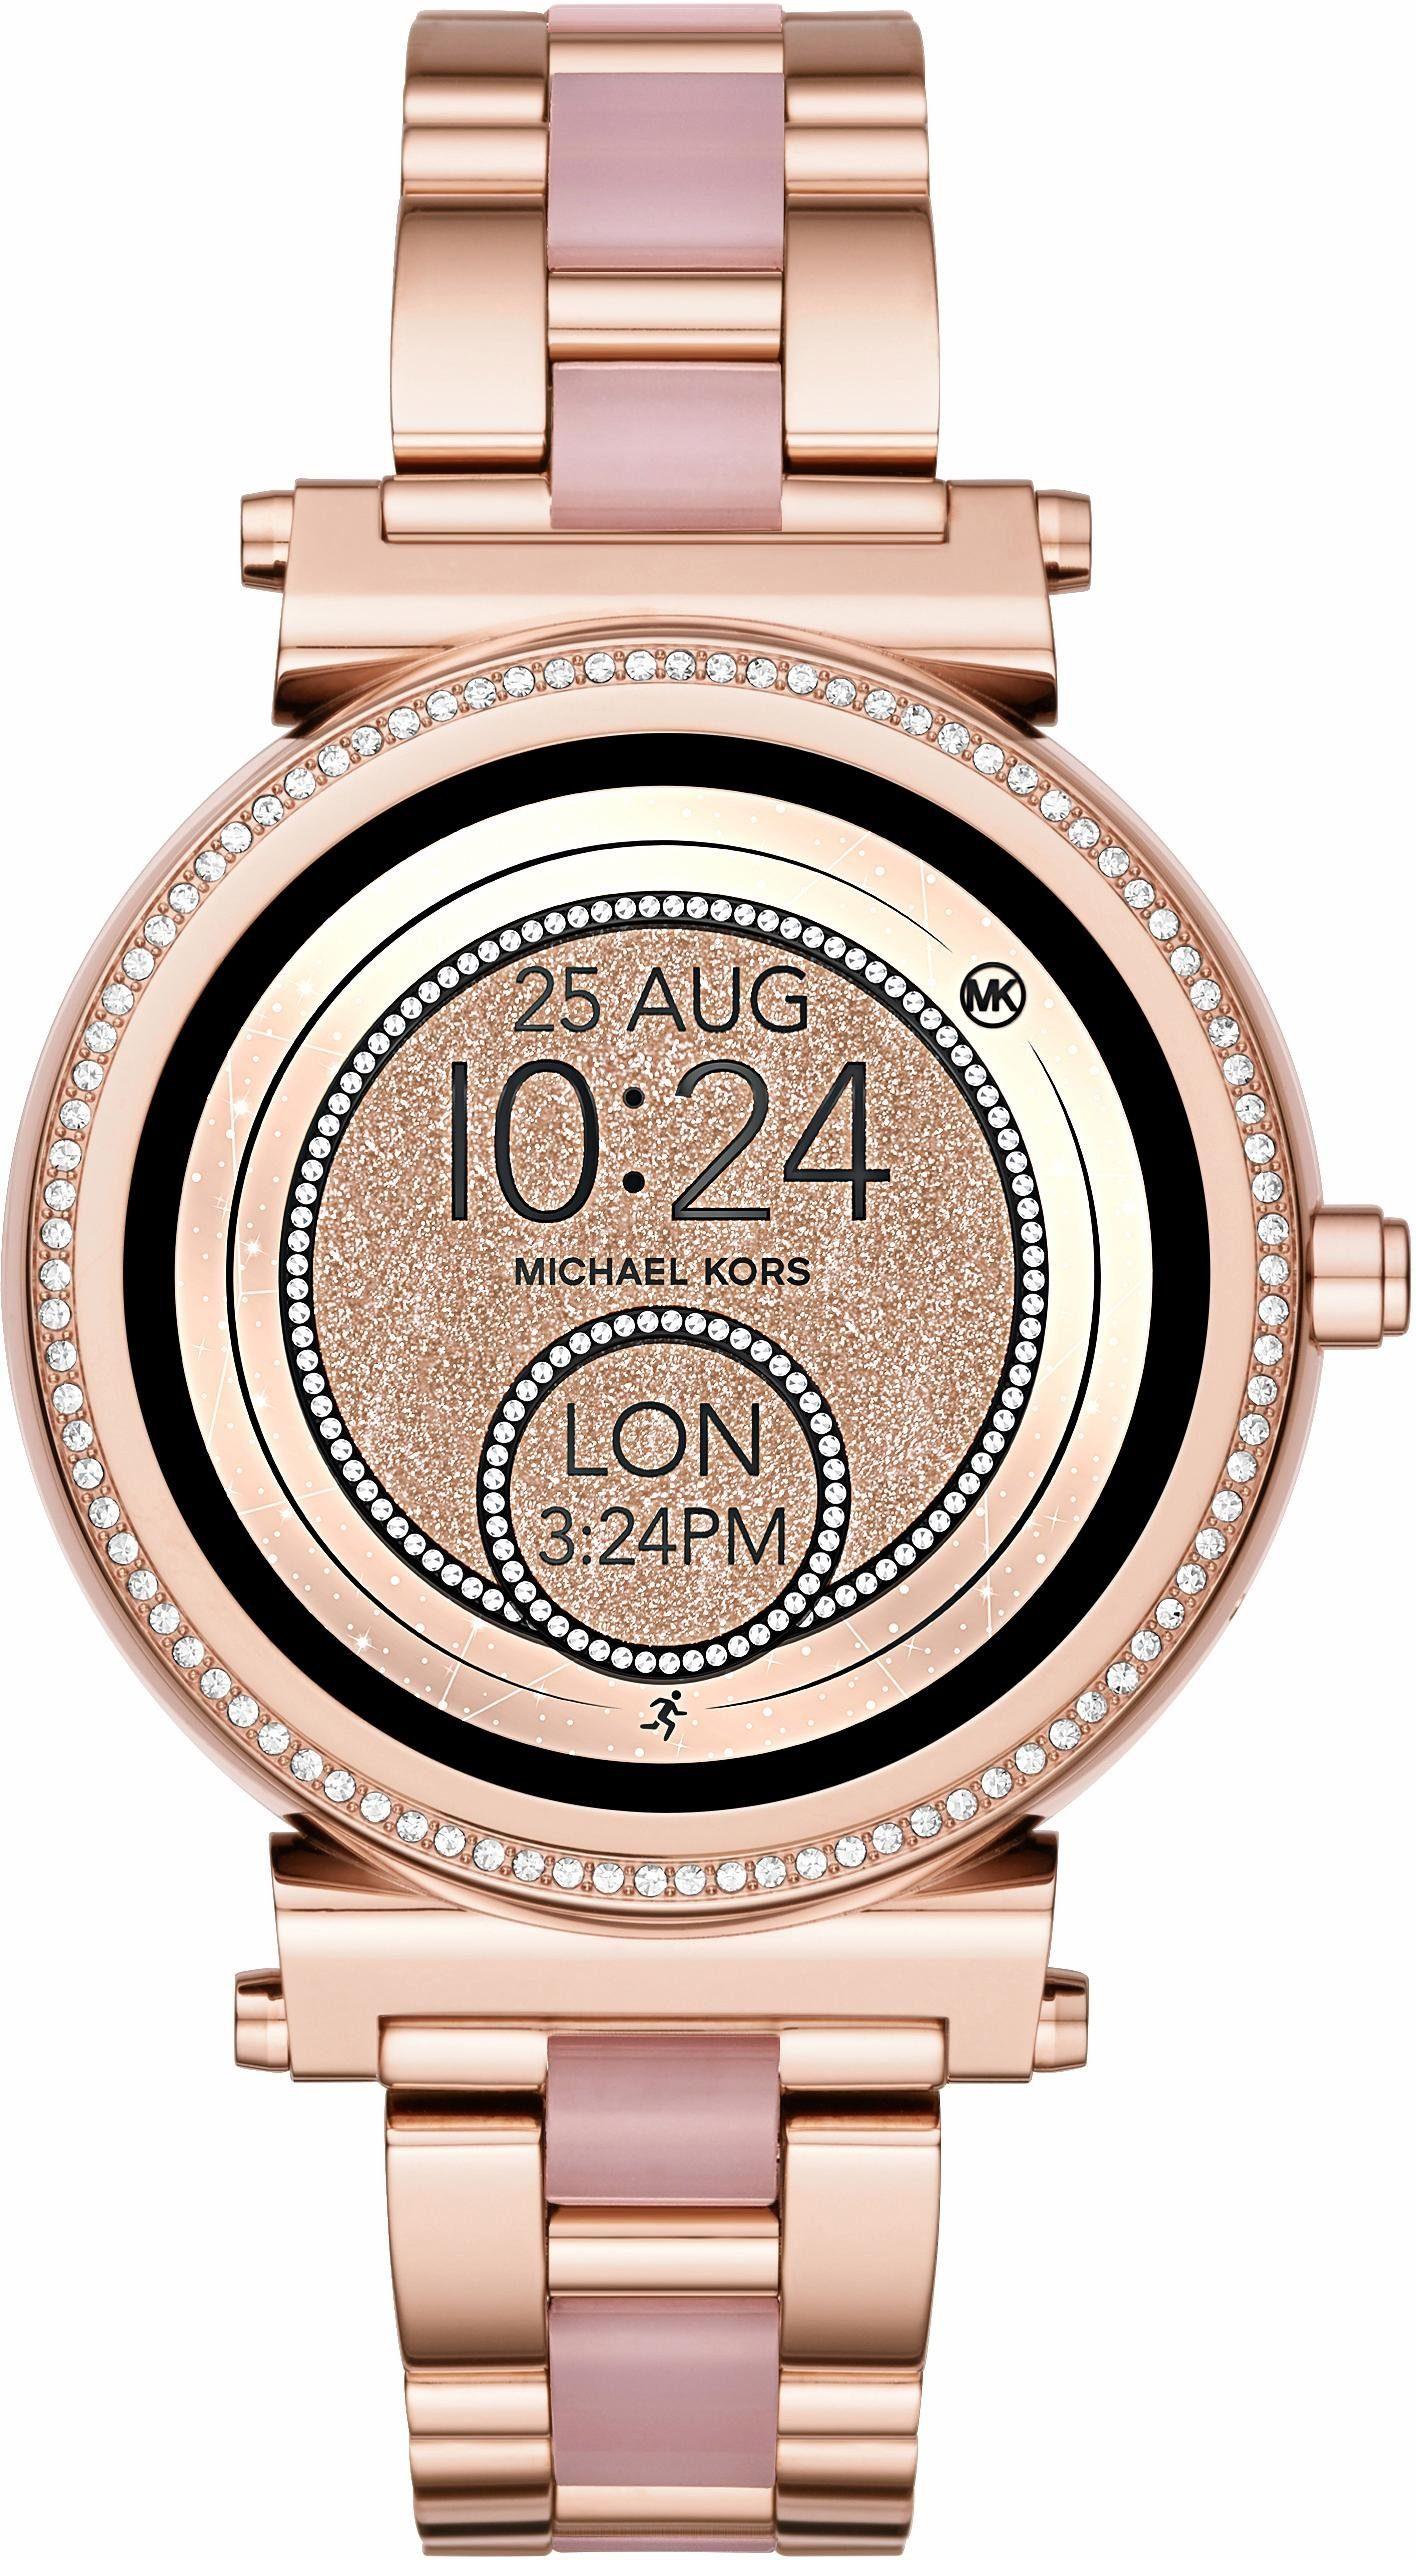 MICHAEL KORS ACCESS SOFIE, MKT5041 Smartwatch (Android Wear, inkl. Dornschließe für Wechselband)